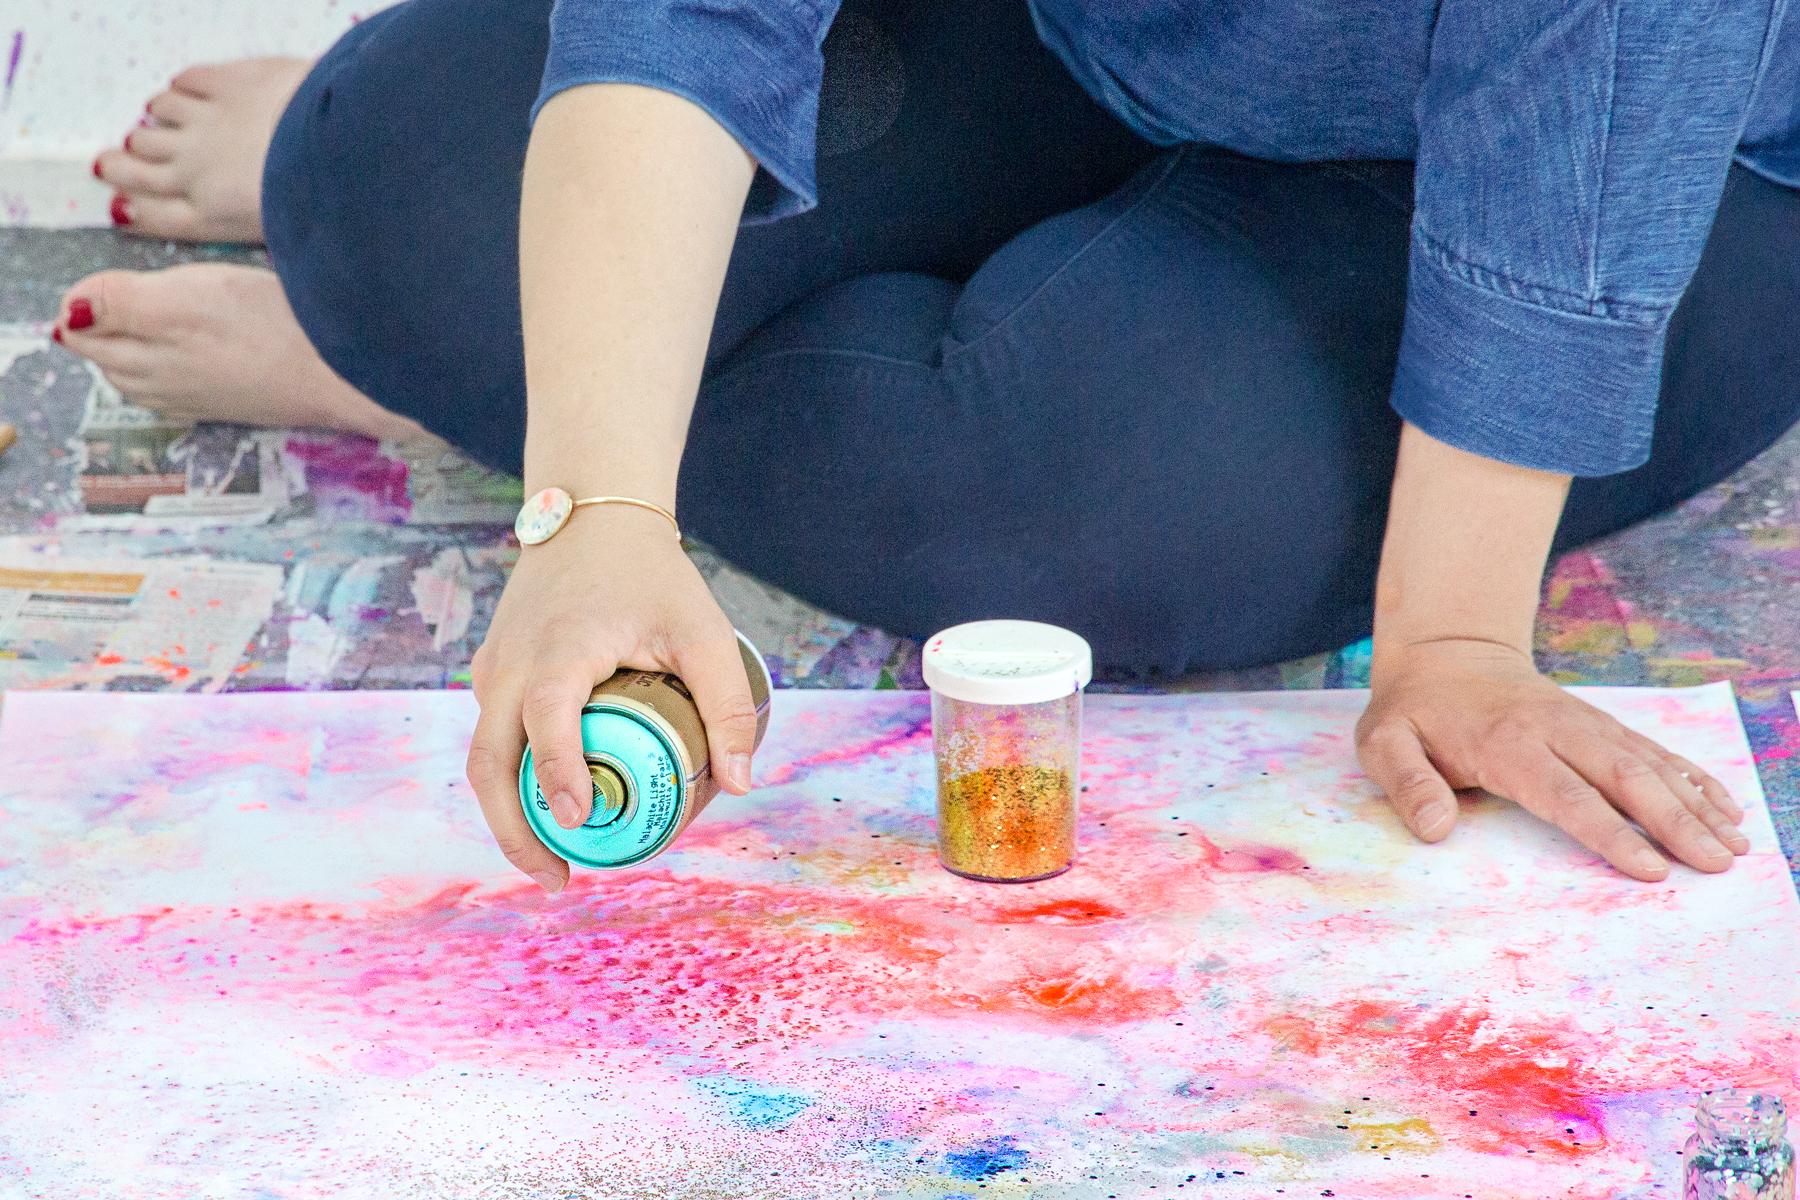 Kerstin Pressler, Fine artist, www.kerstinpressler.com/art-about